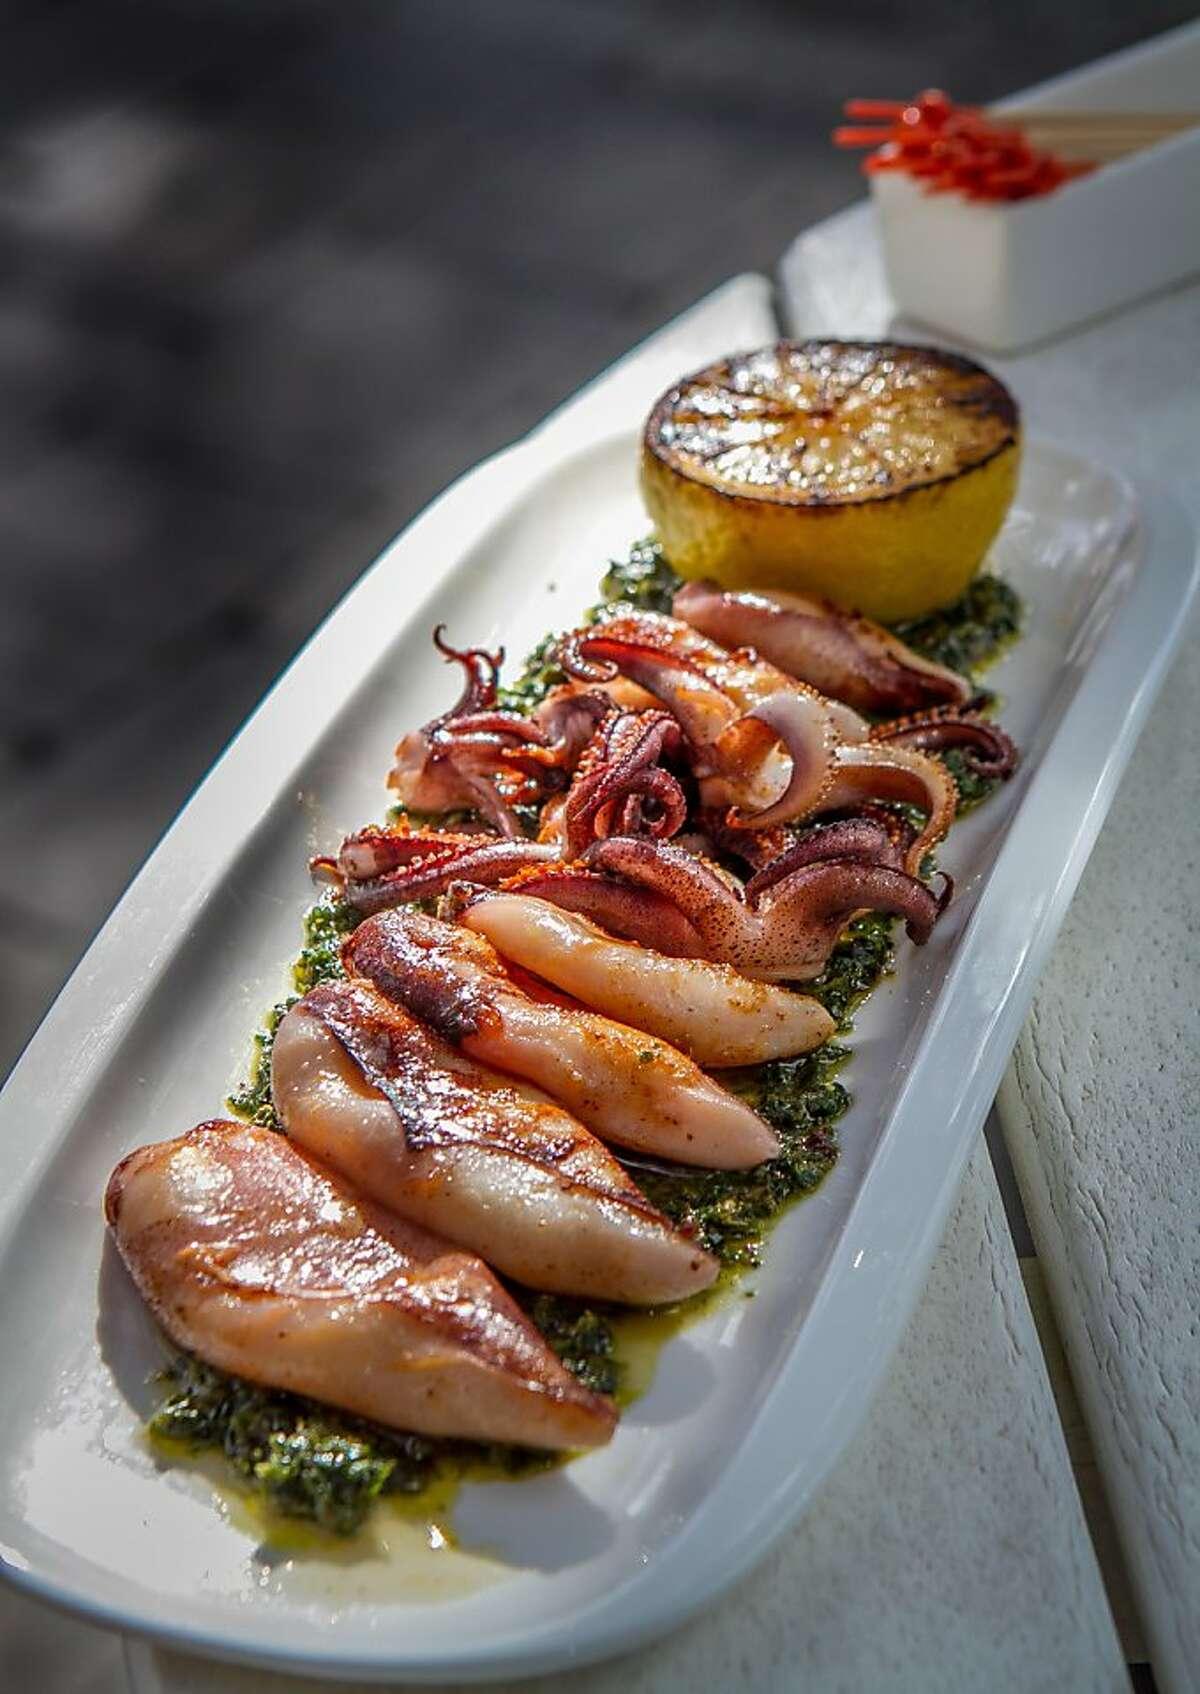 The Monterey Calamari at Bravas Bar de Tapas in Healdsburg, Calif. is seen on Thursday, February 7th, 2013